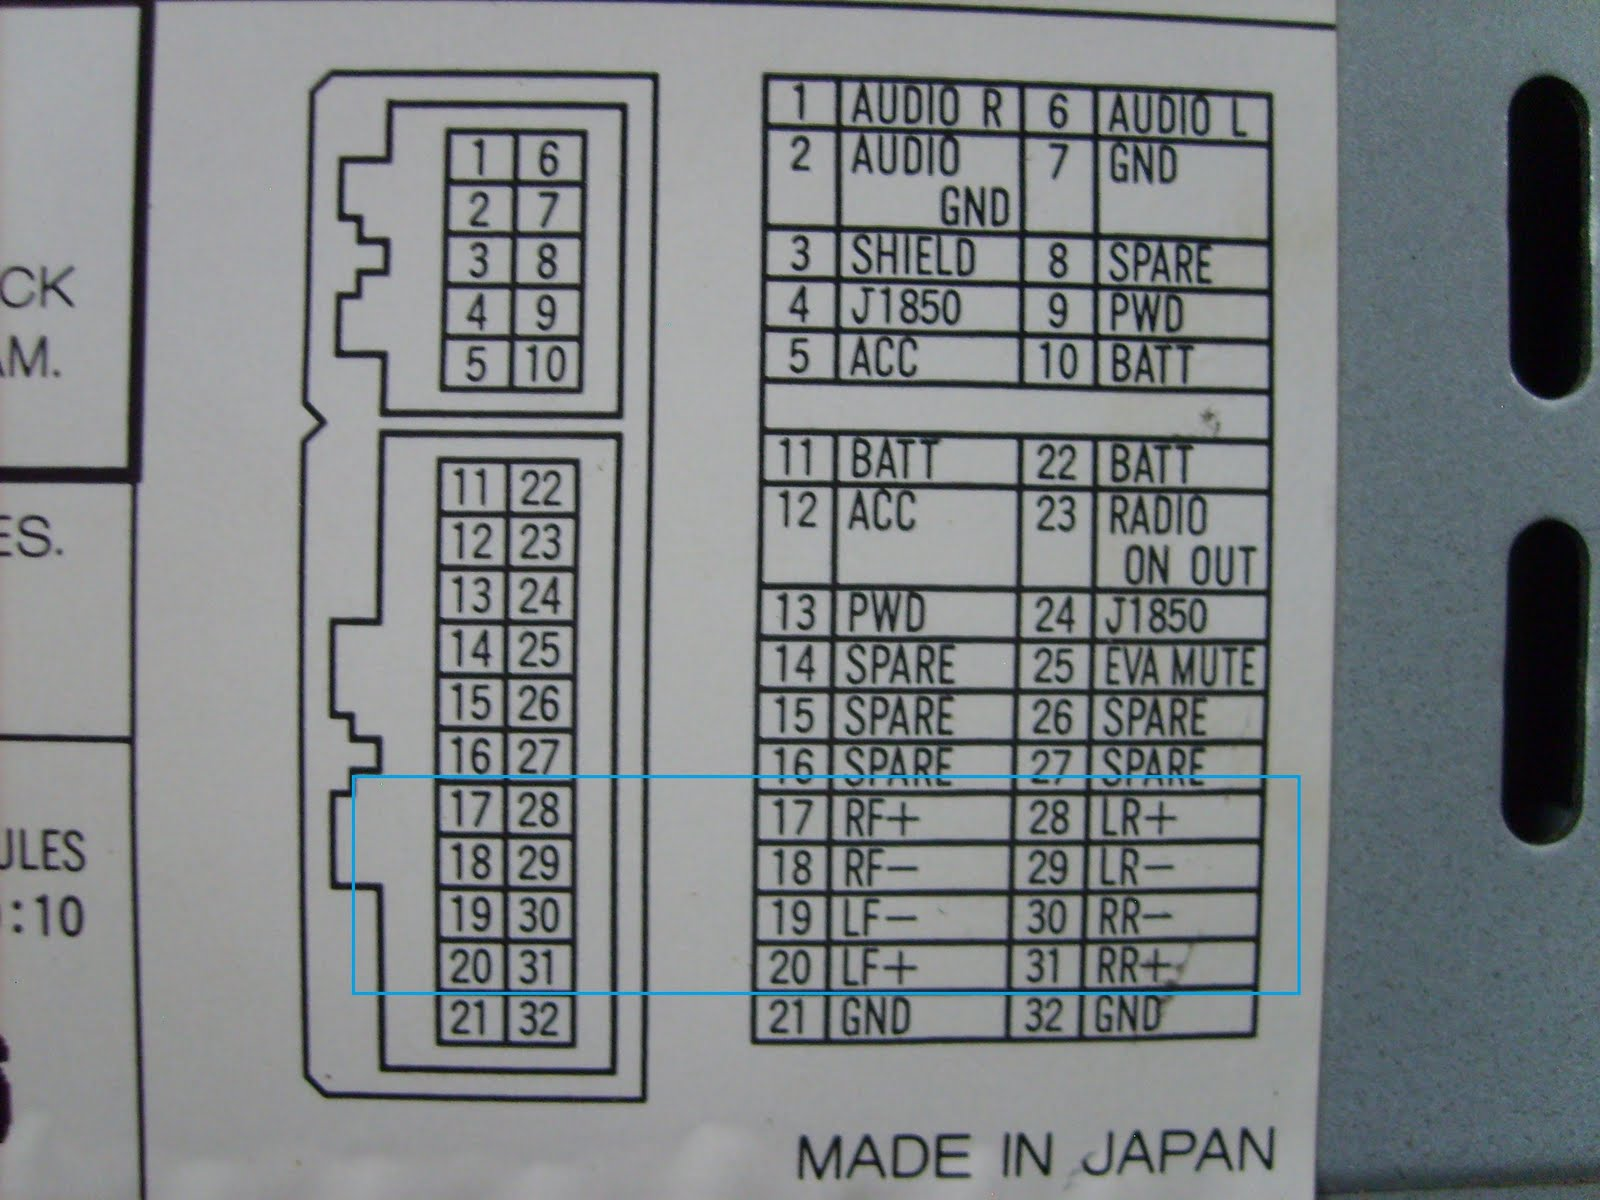 2006 dodge radio wiring diagram 2500 wiring diagram fascinating 2006 dodge ram 1500 factory radio wiring diagram ideas 1999 dodge truck wiring diagram 2006 dodge radio wiring diagram 2500 asfbconference2016 Choice Image